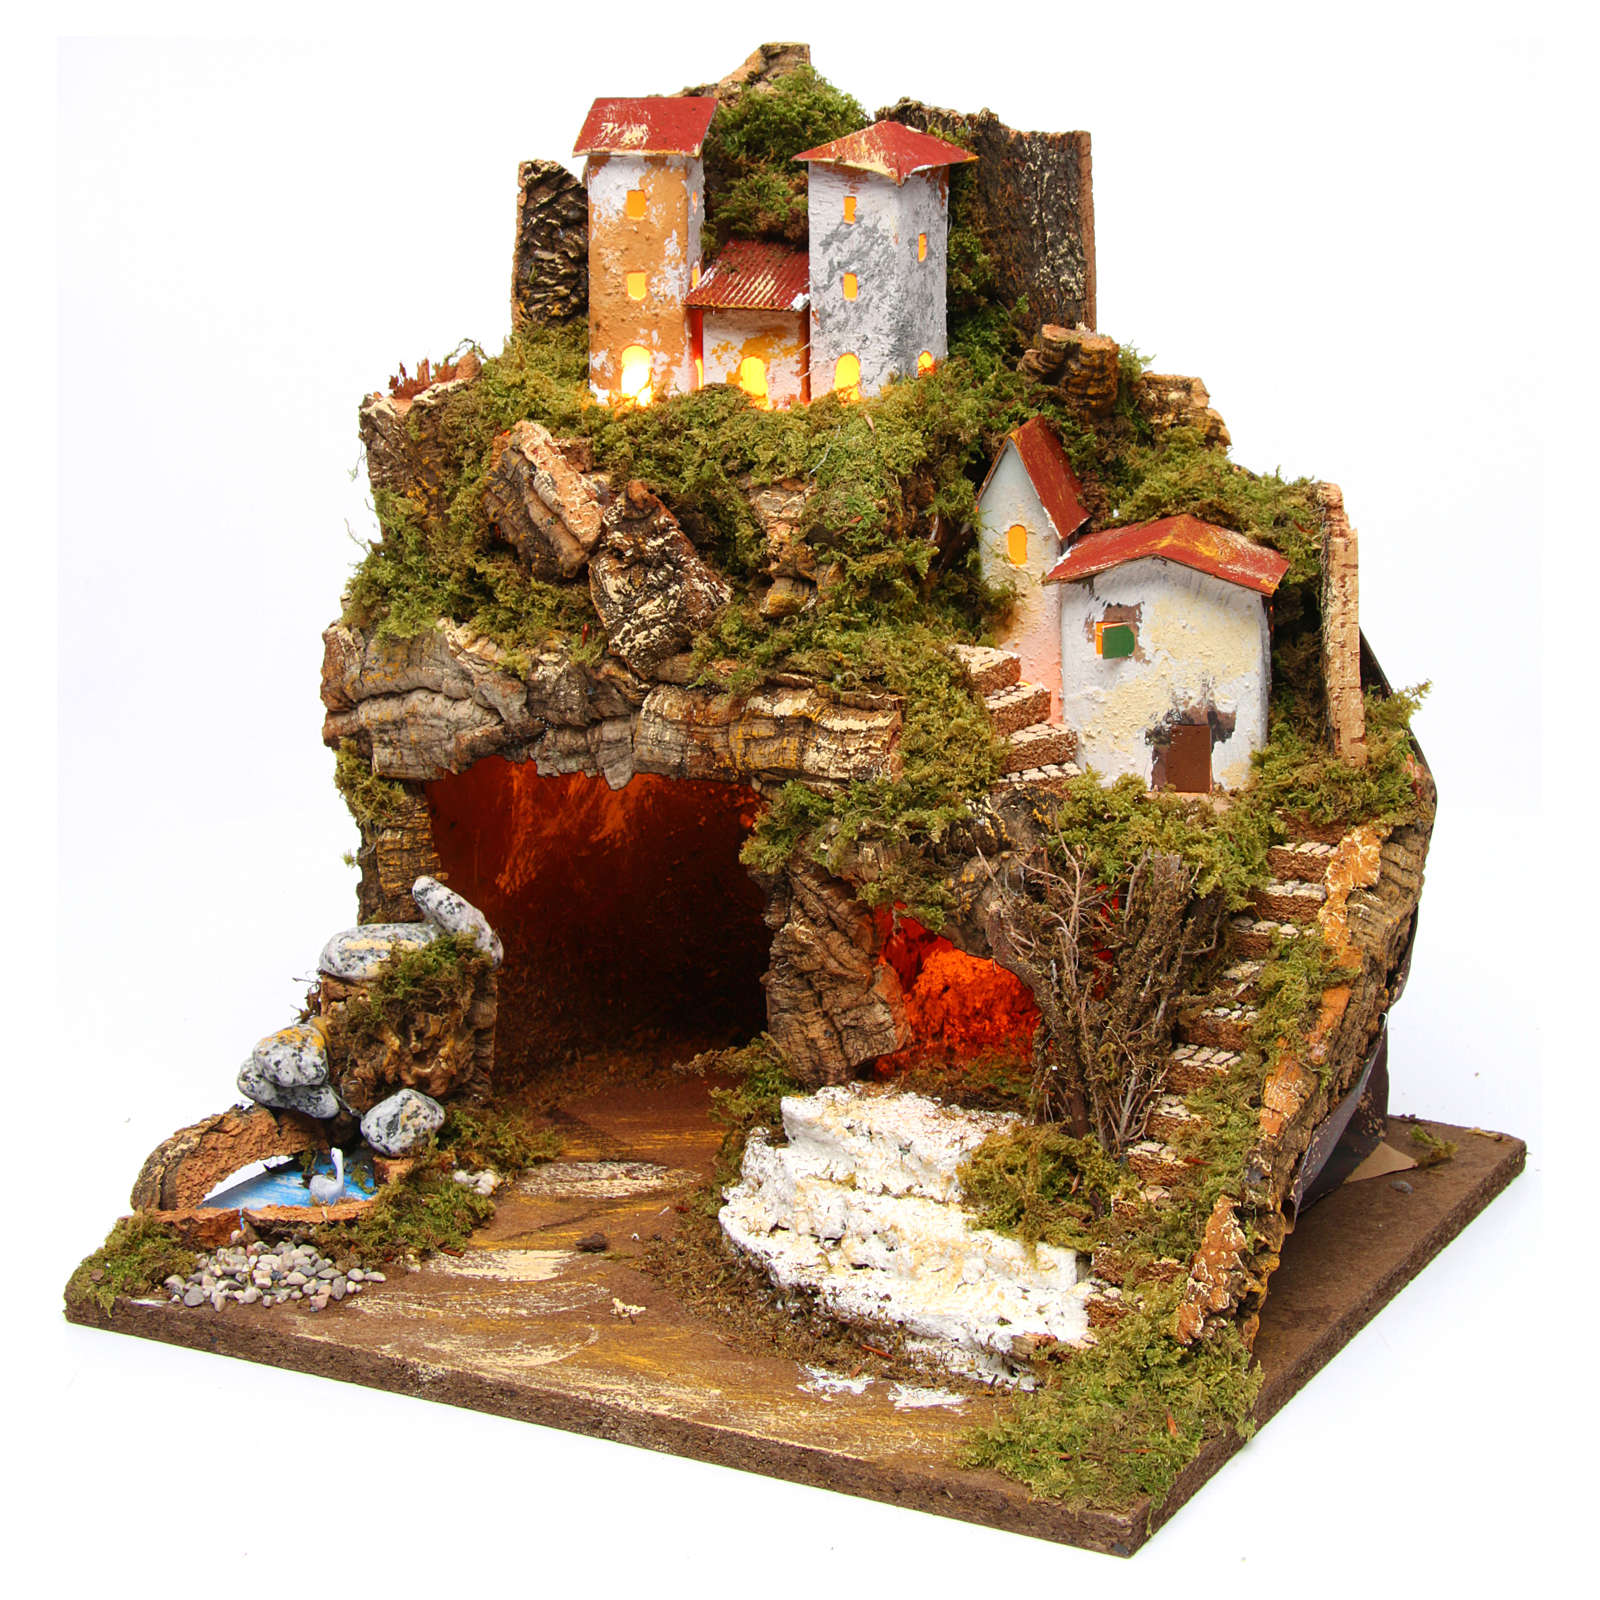 Lighted stable in hamlet for 8-10 cm Nativity Scene 35x33x30 cm 4